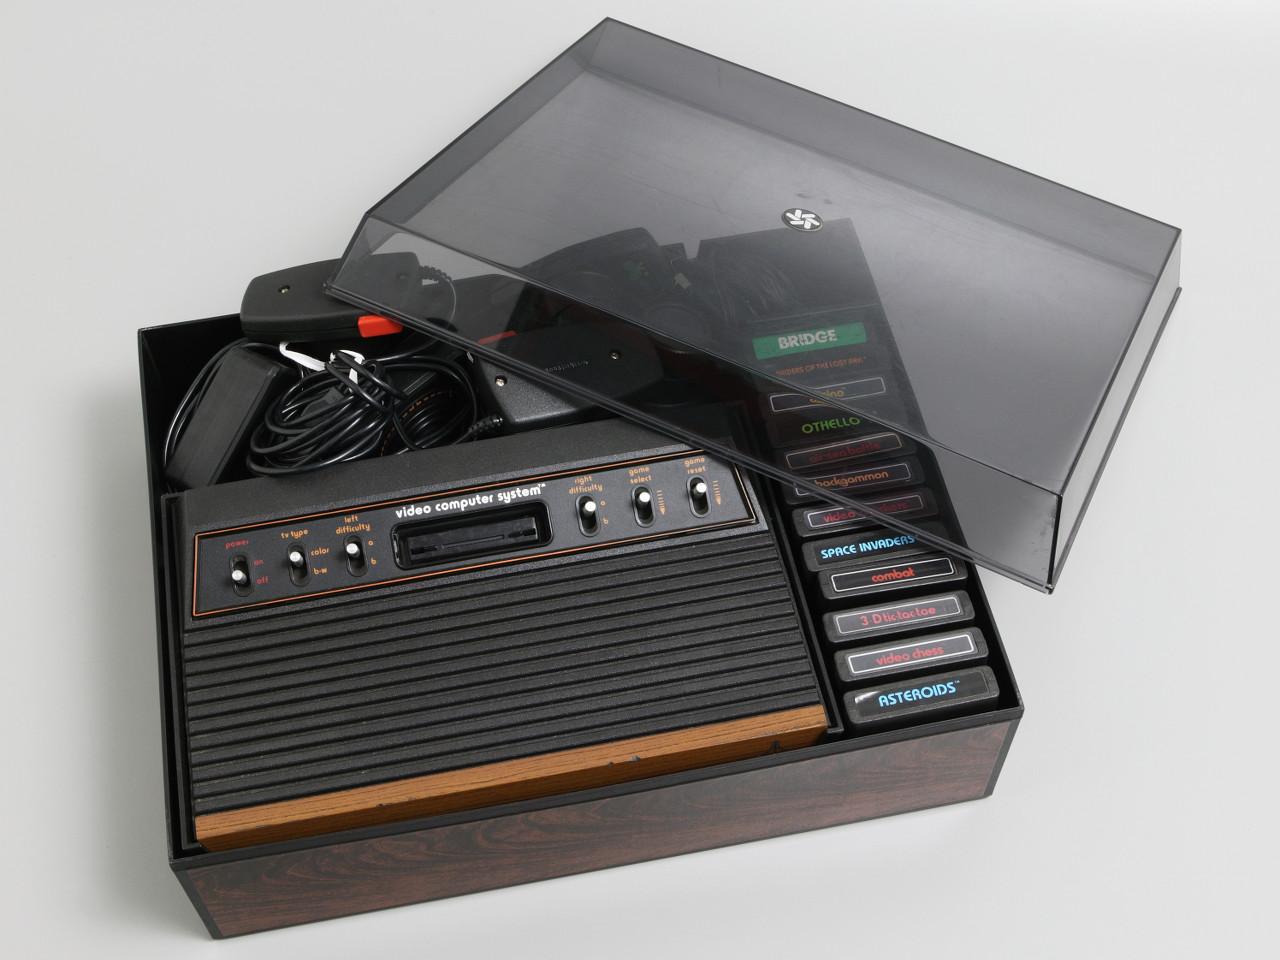 Ein Atari VCS mit Joysticks und diversen Spielmodulen. (Bild: powerhousemuseum.com)